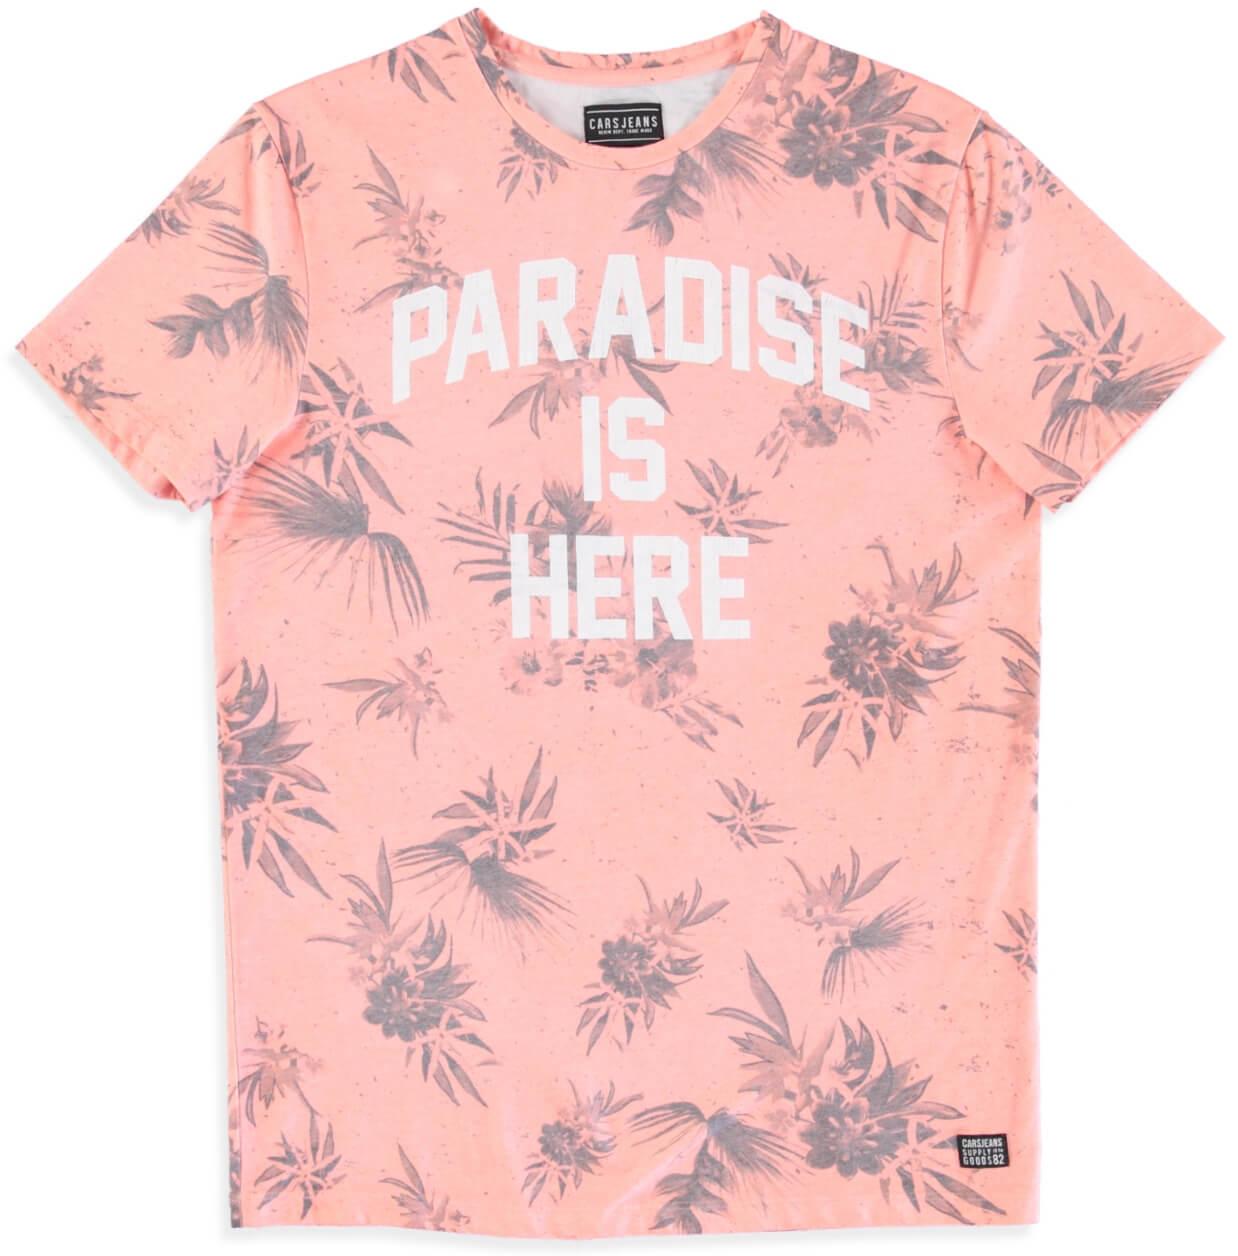 4014764 Koralle Cars Shirt Herren Vivantis Paradise T Sich Jeans qSTfwX